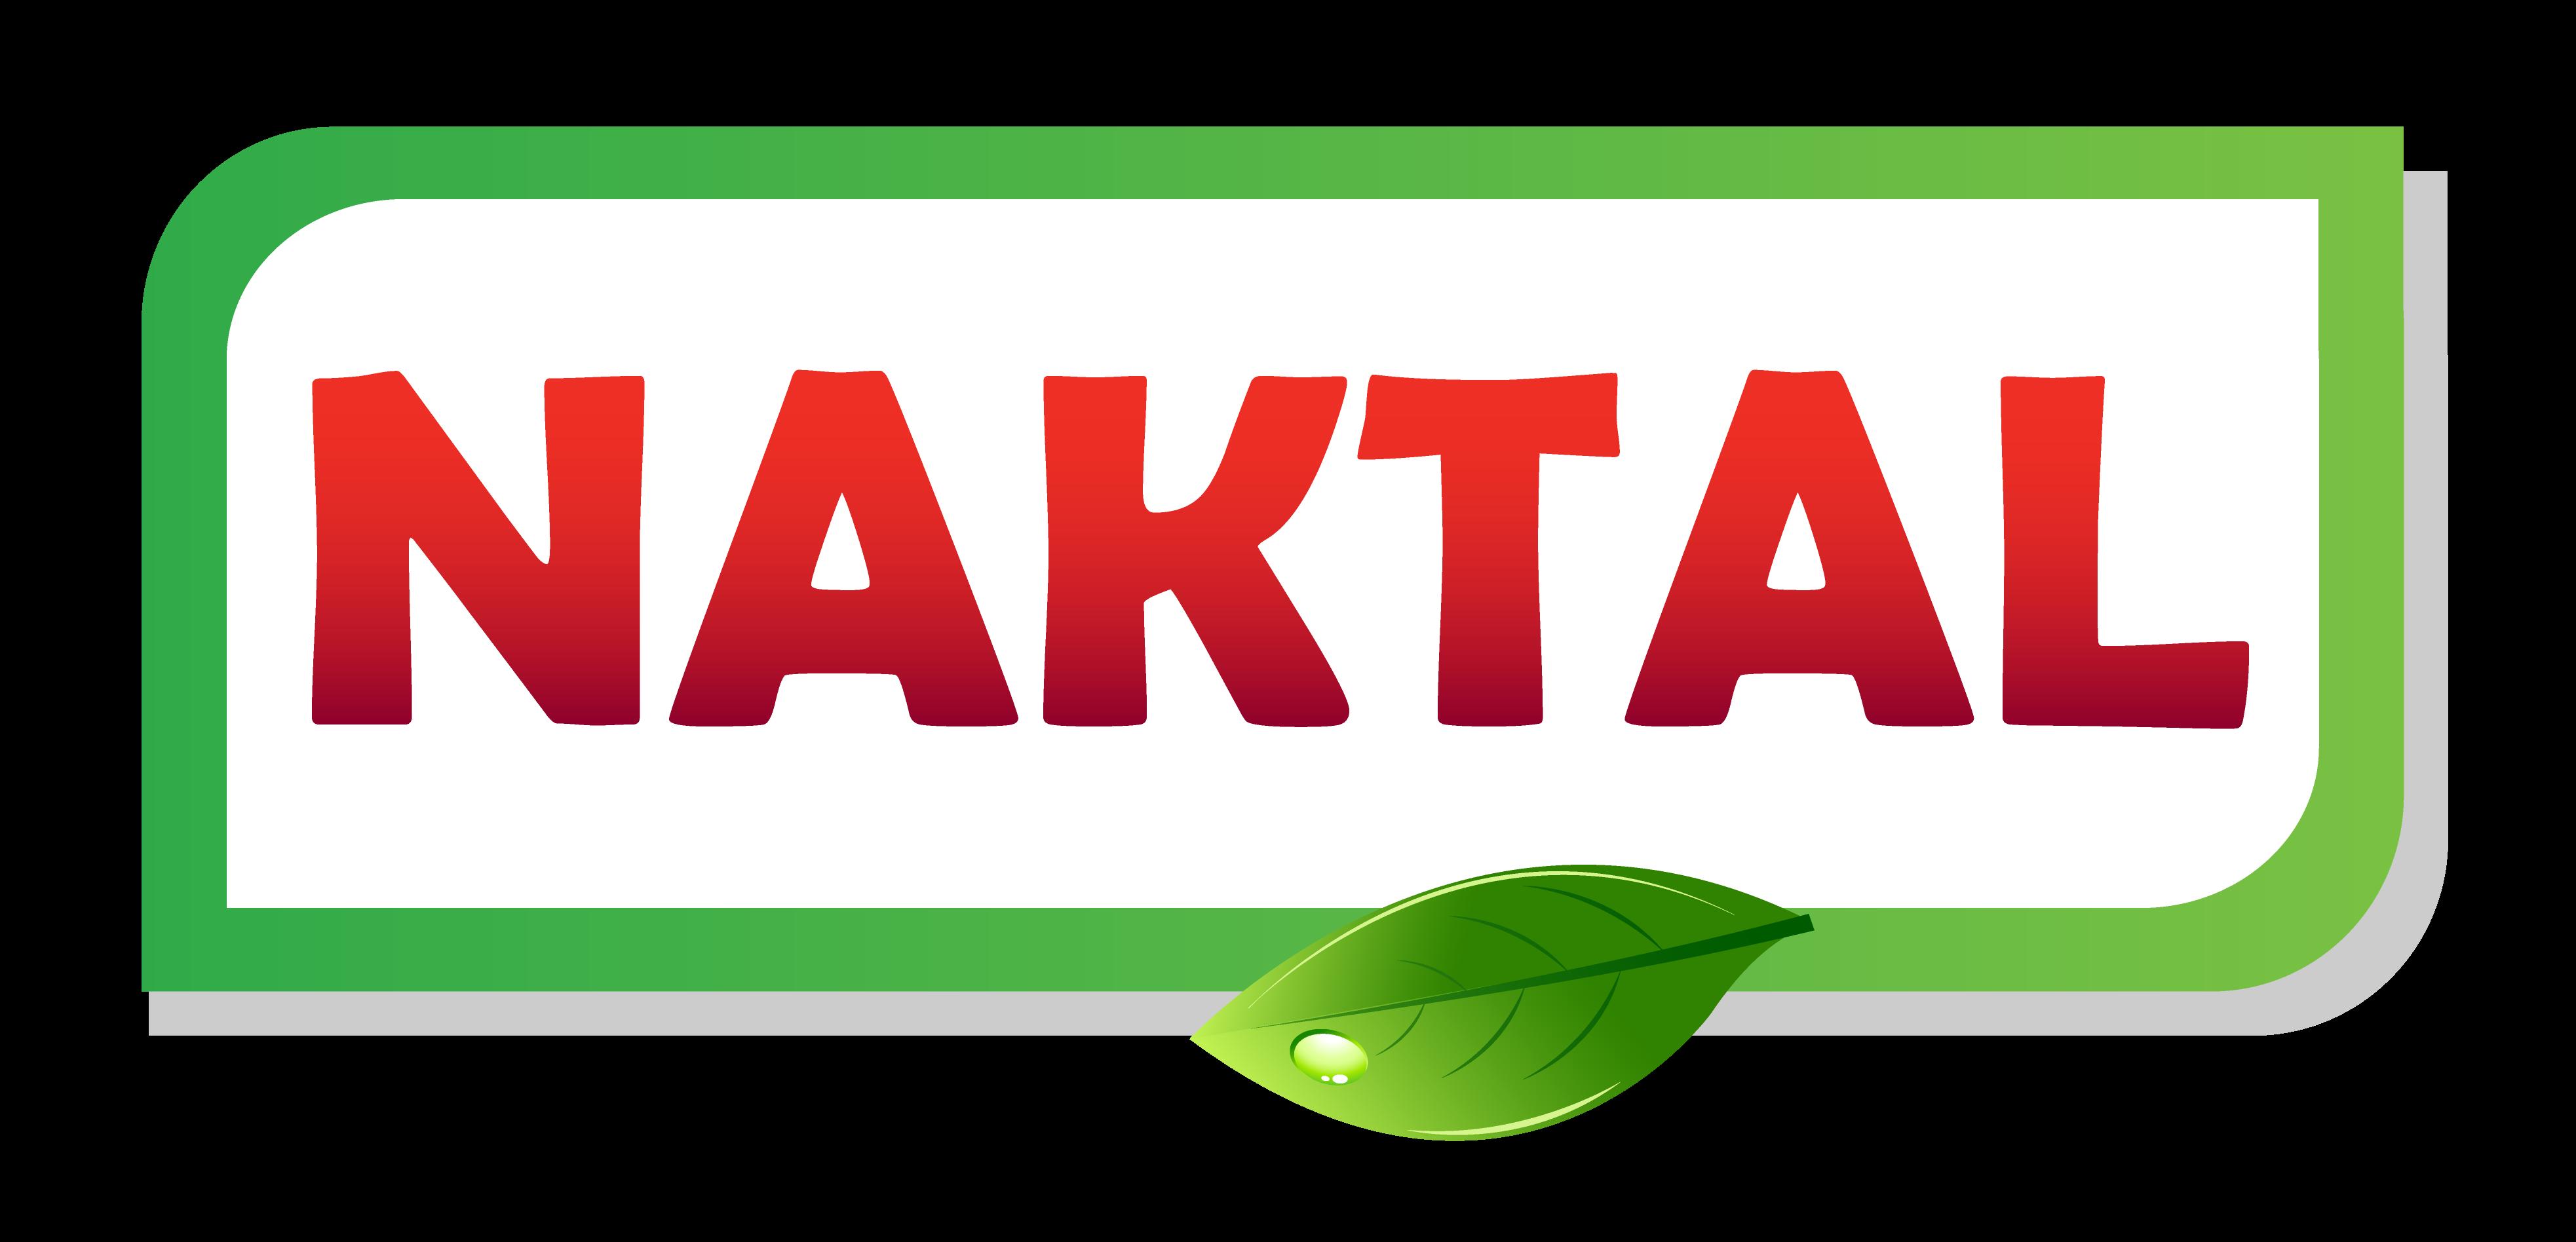 Naktal Consumer Foods